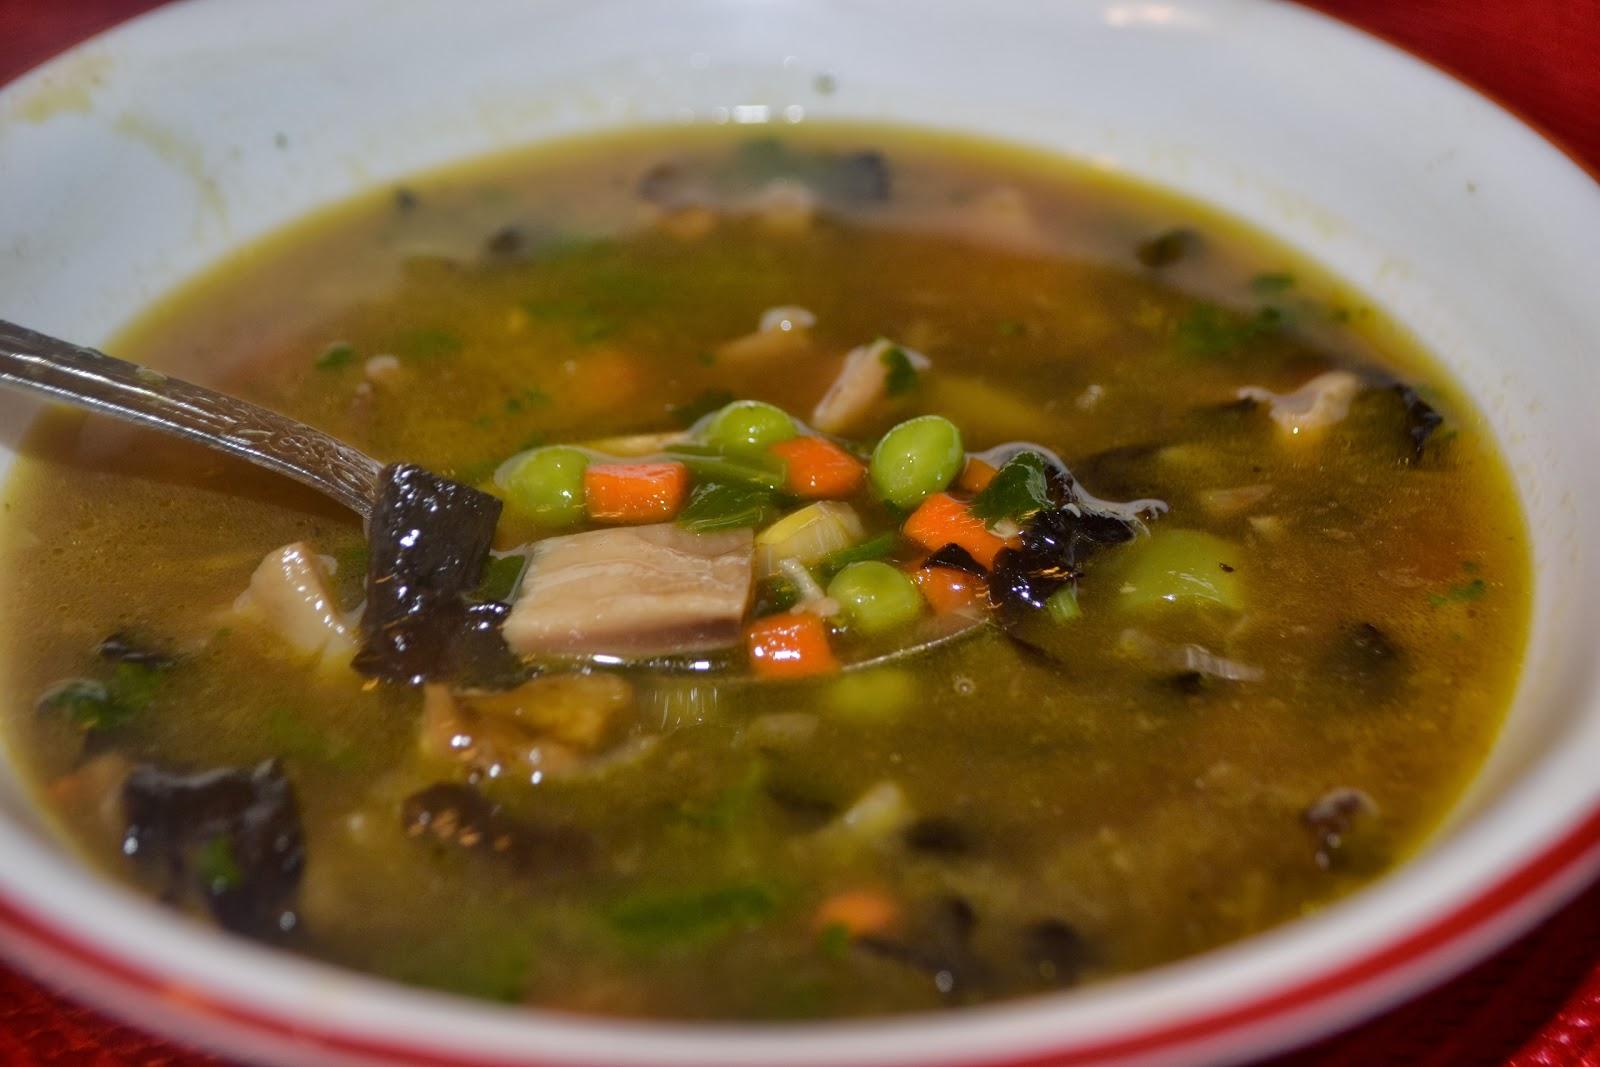 http://foodandbeyondfans.blogspot.com/2013/10/shroom-soup.html